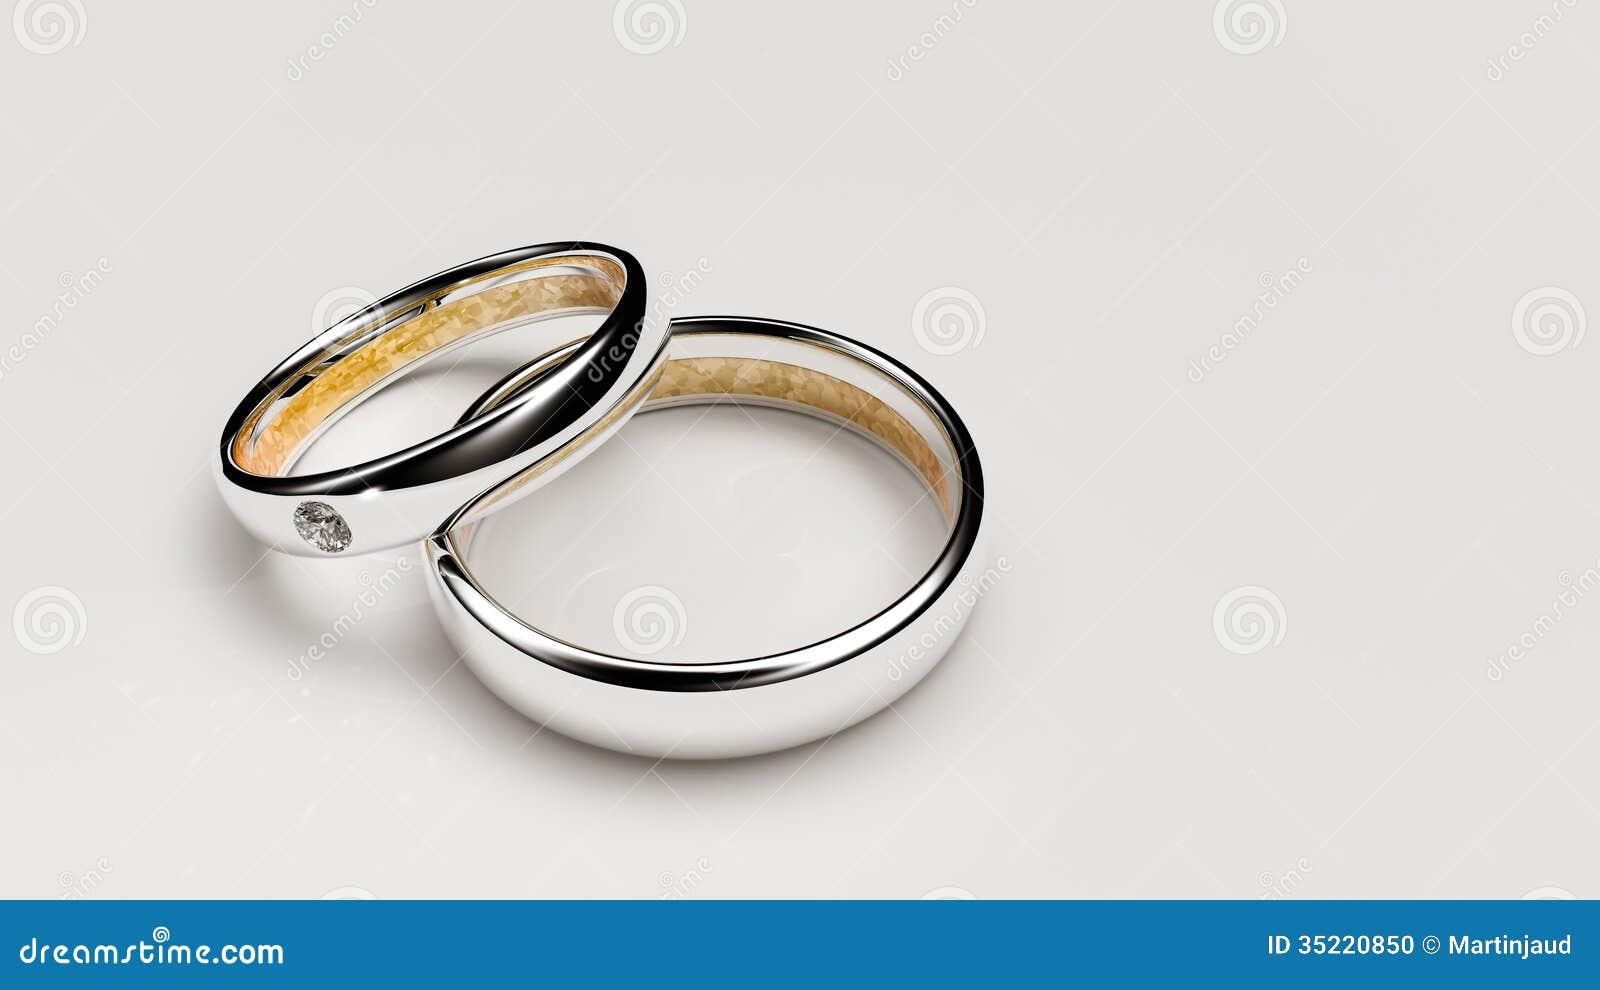 wedding band business plan